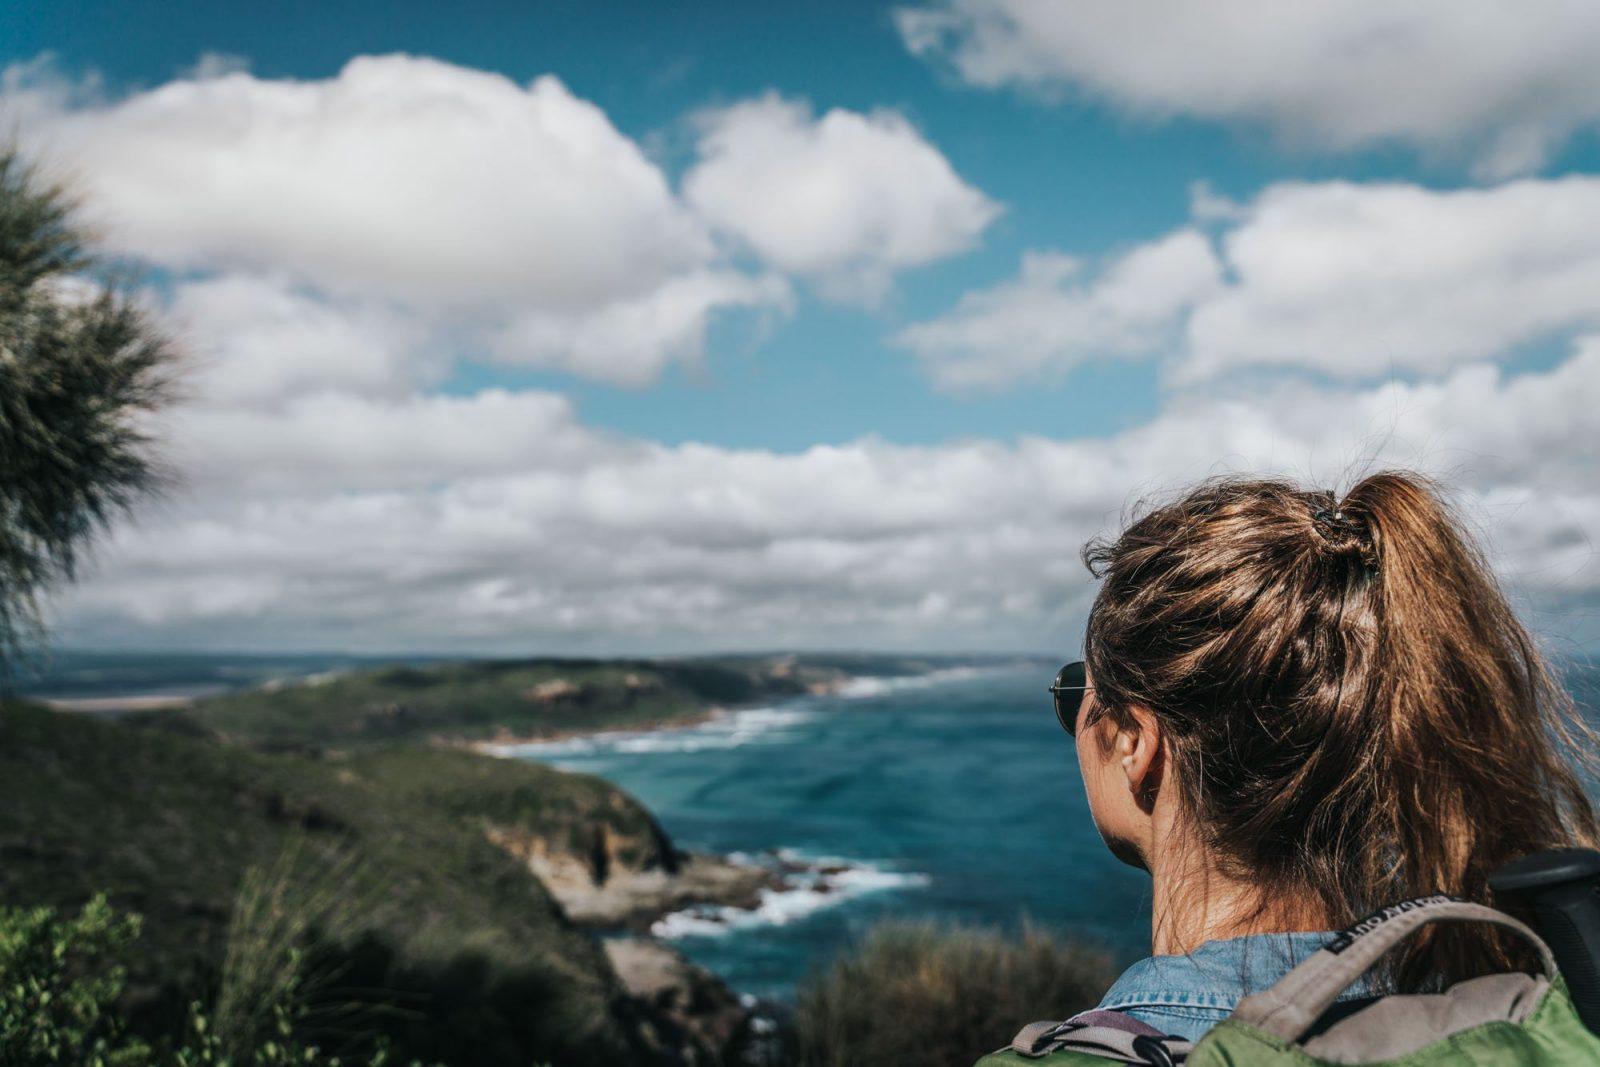 Overlooking the coastline of the Great Ocean Walk, carbon offset programs